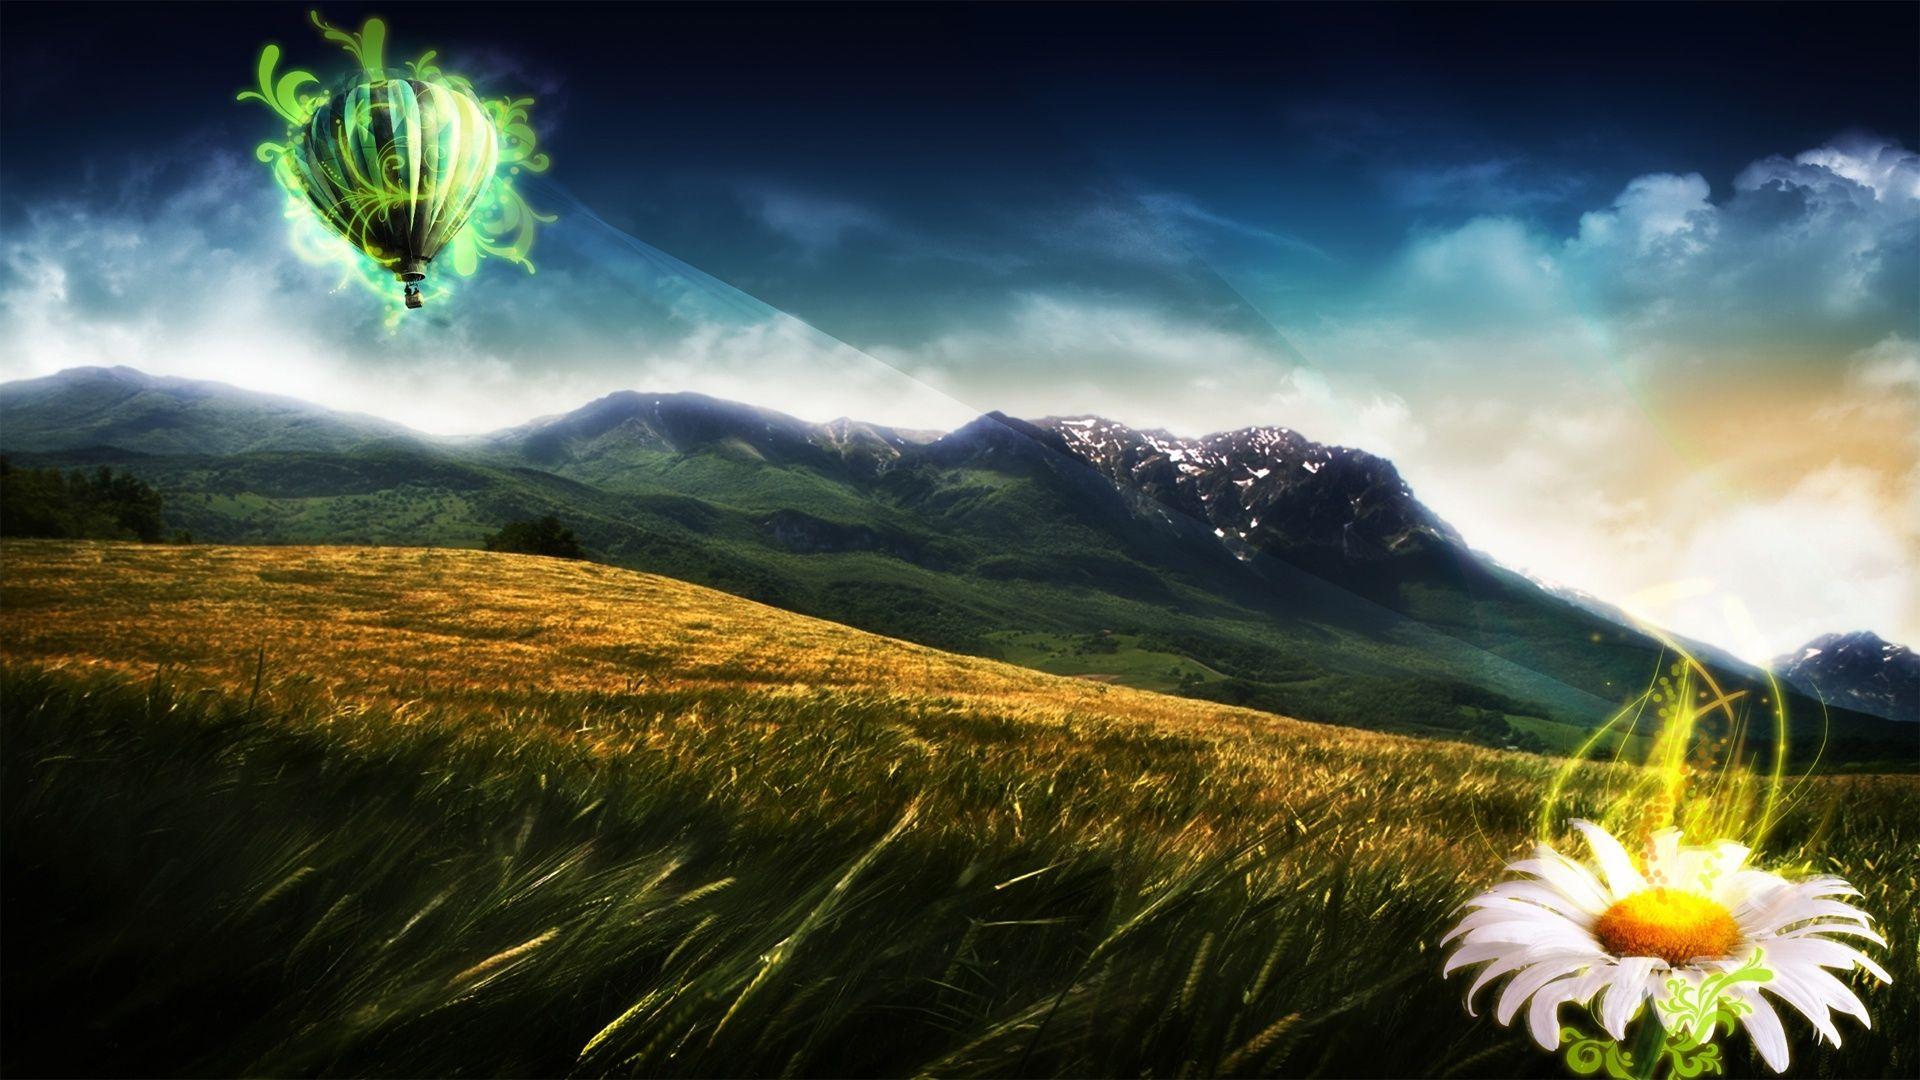 3D Landscape Mountain Balloon Ride picture nr 60703 1920x1080